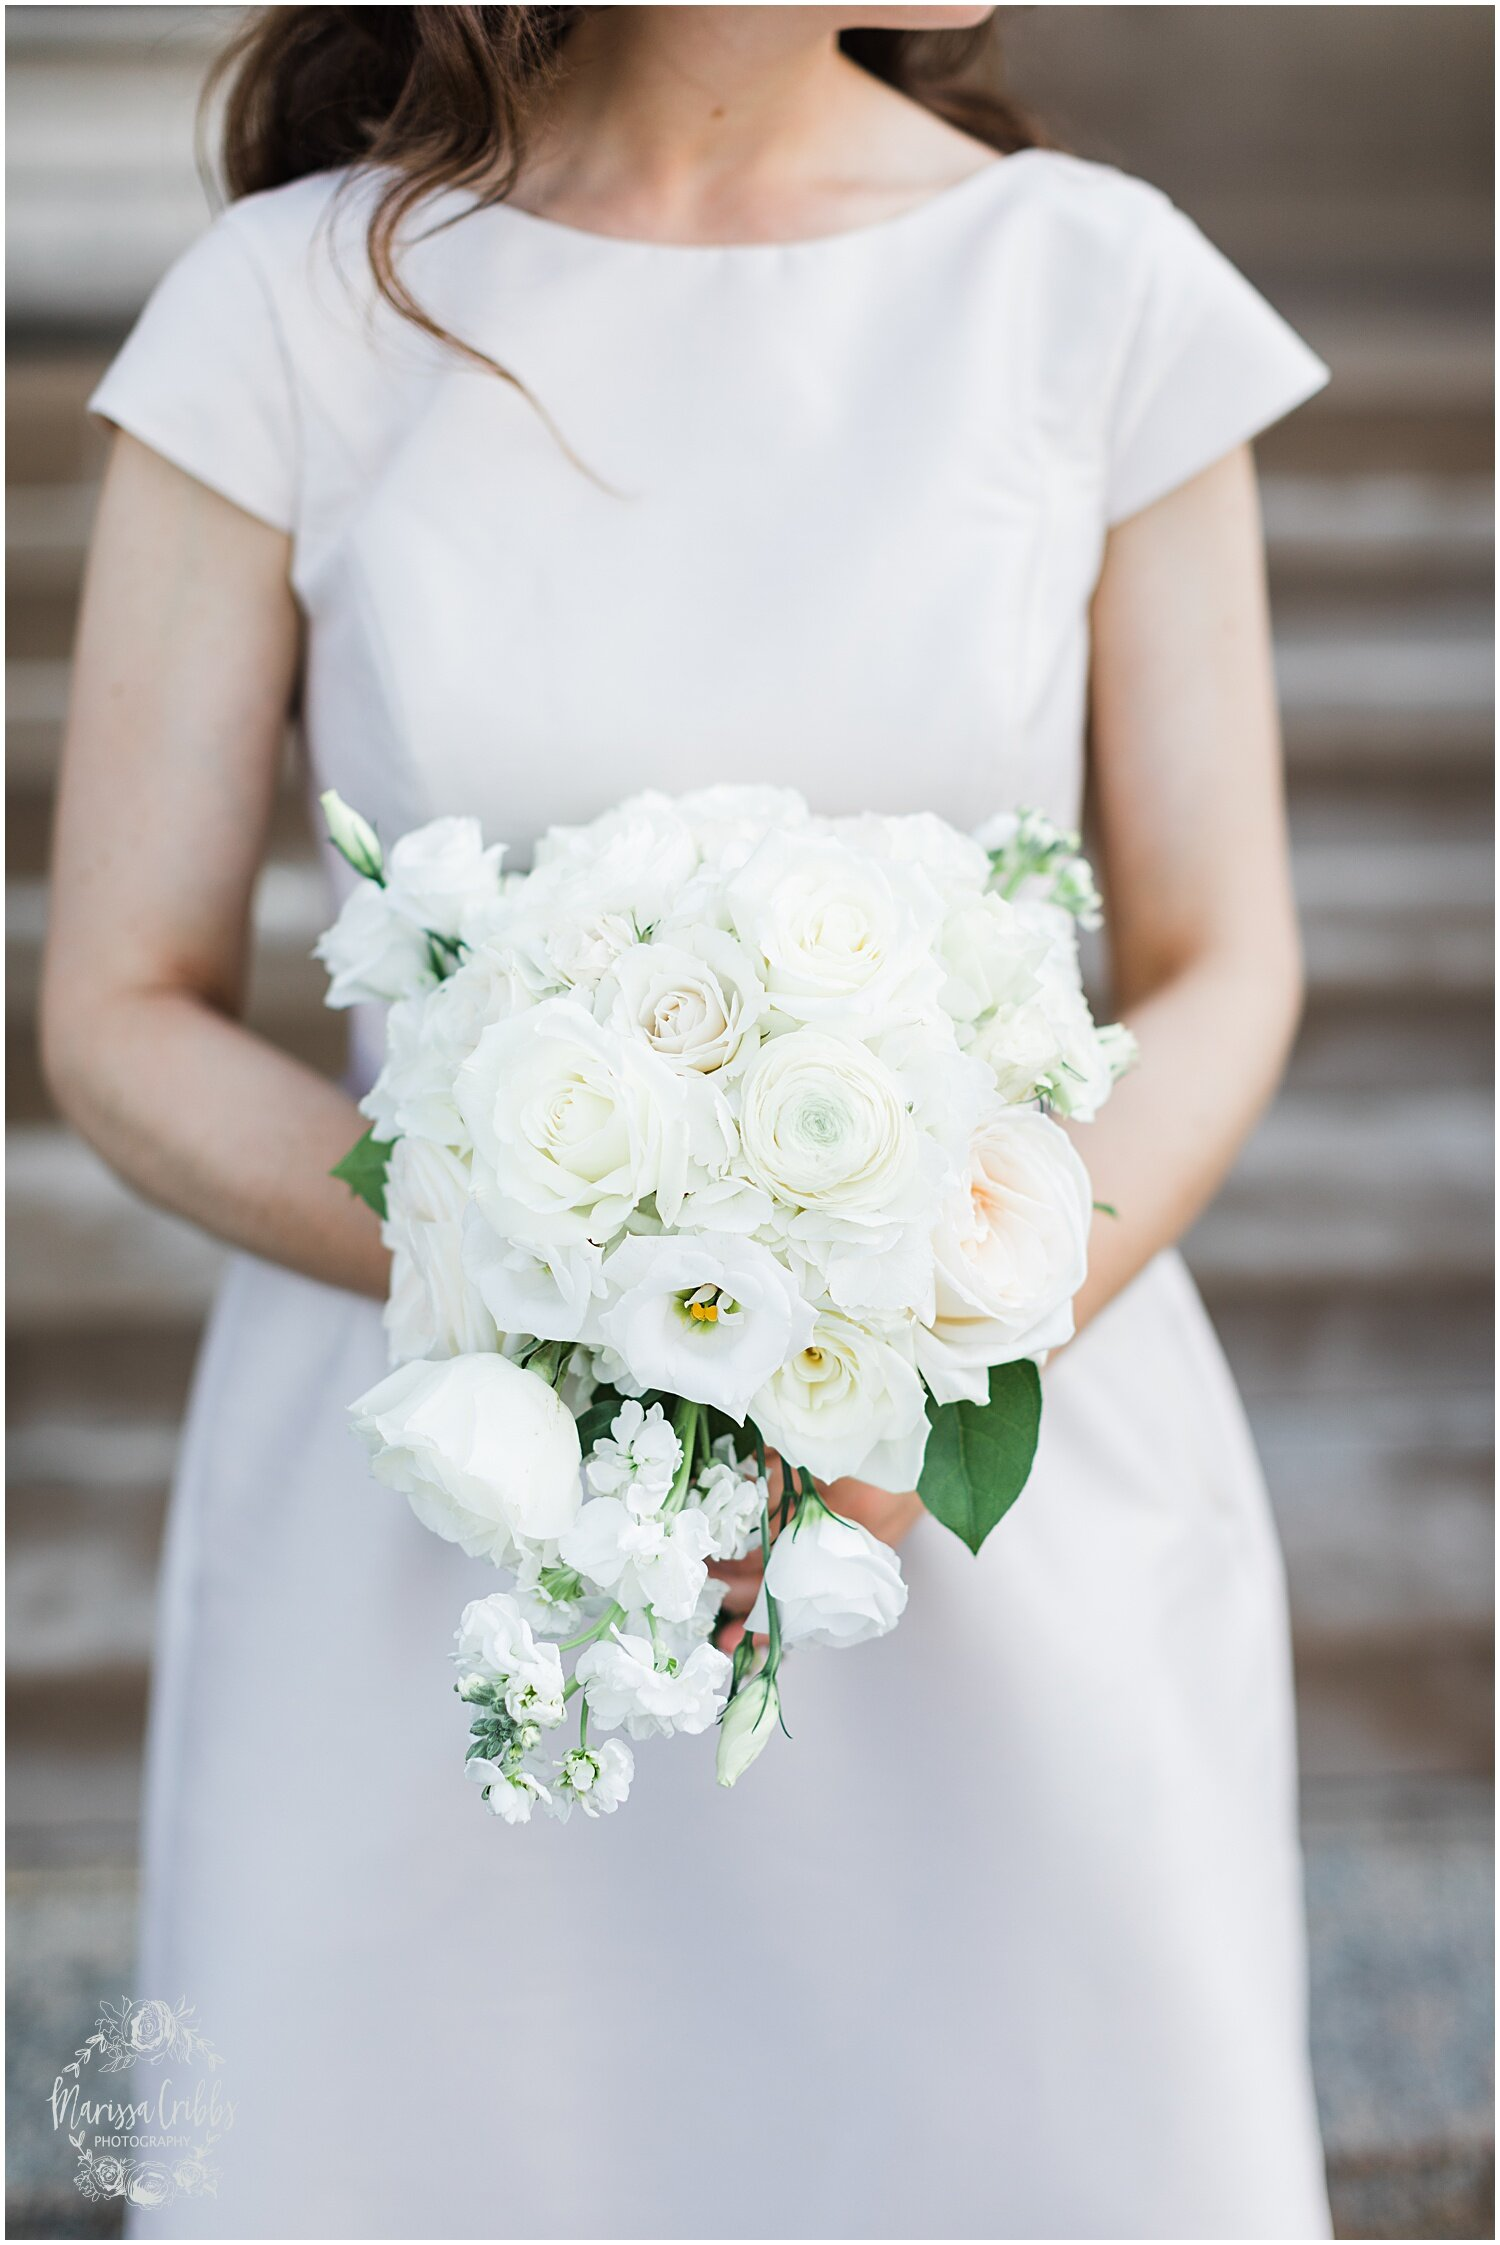 TYLER & CAROLINE MARRIED BLOG | MARISSA CRIBBS PHOTOGRAPHY | THE CARRIAGE CLUB | KANSAS CITY WEDDING PHOTOS_9250.jpg